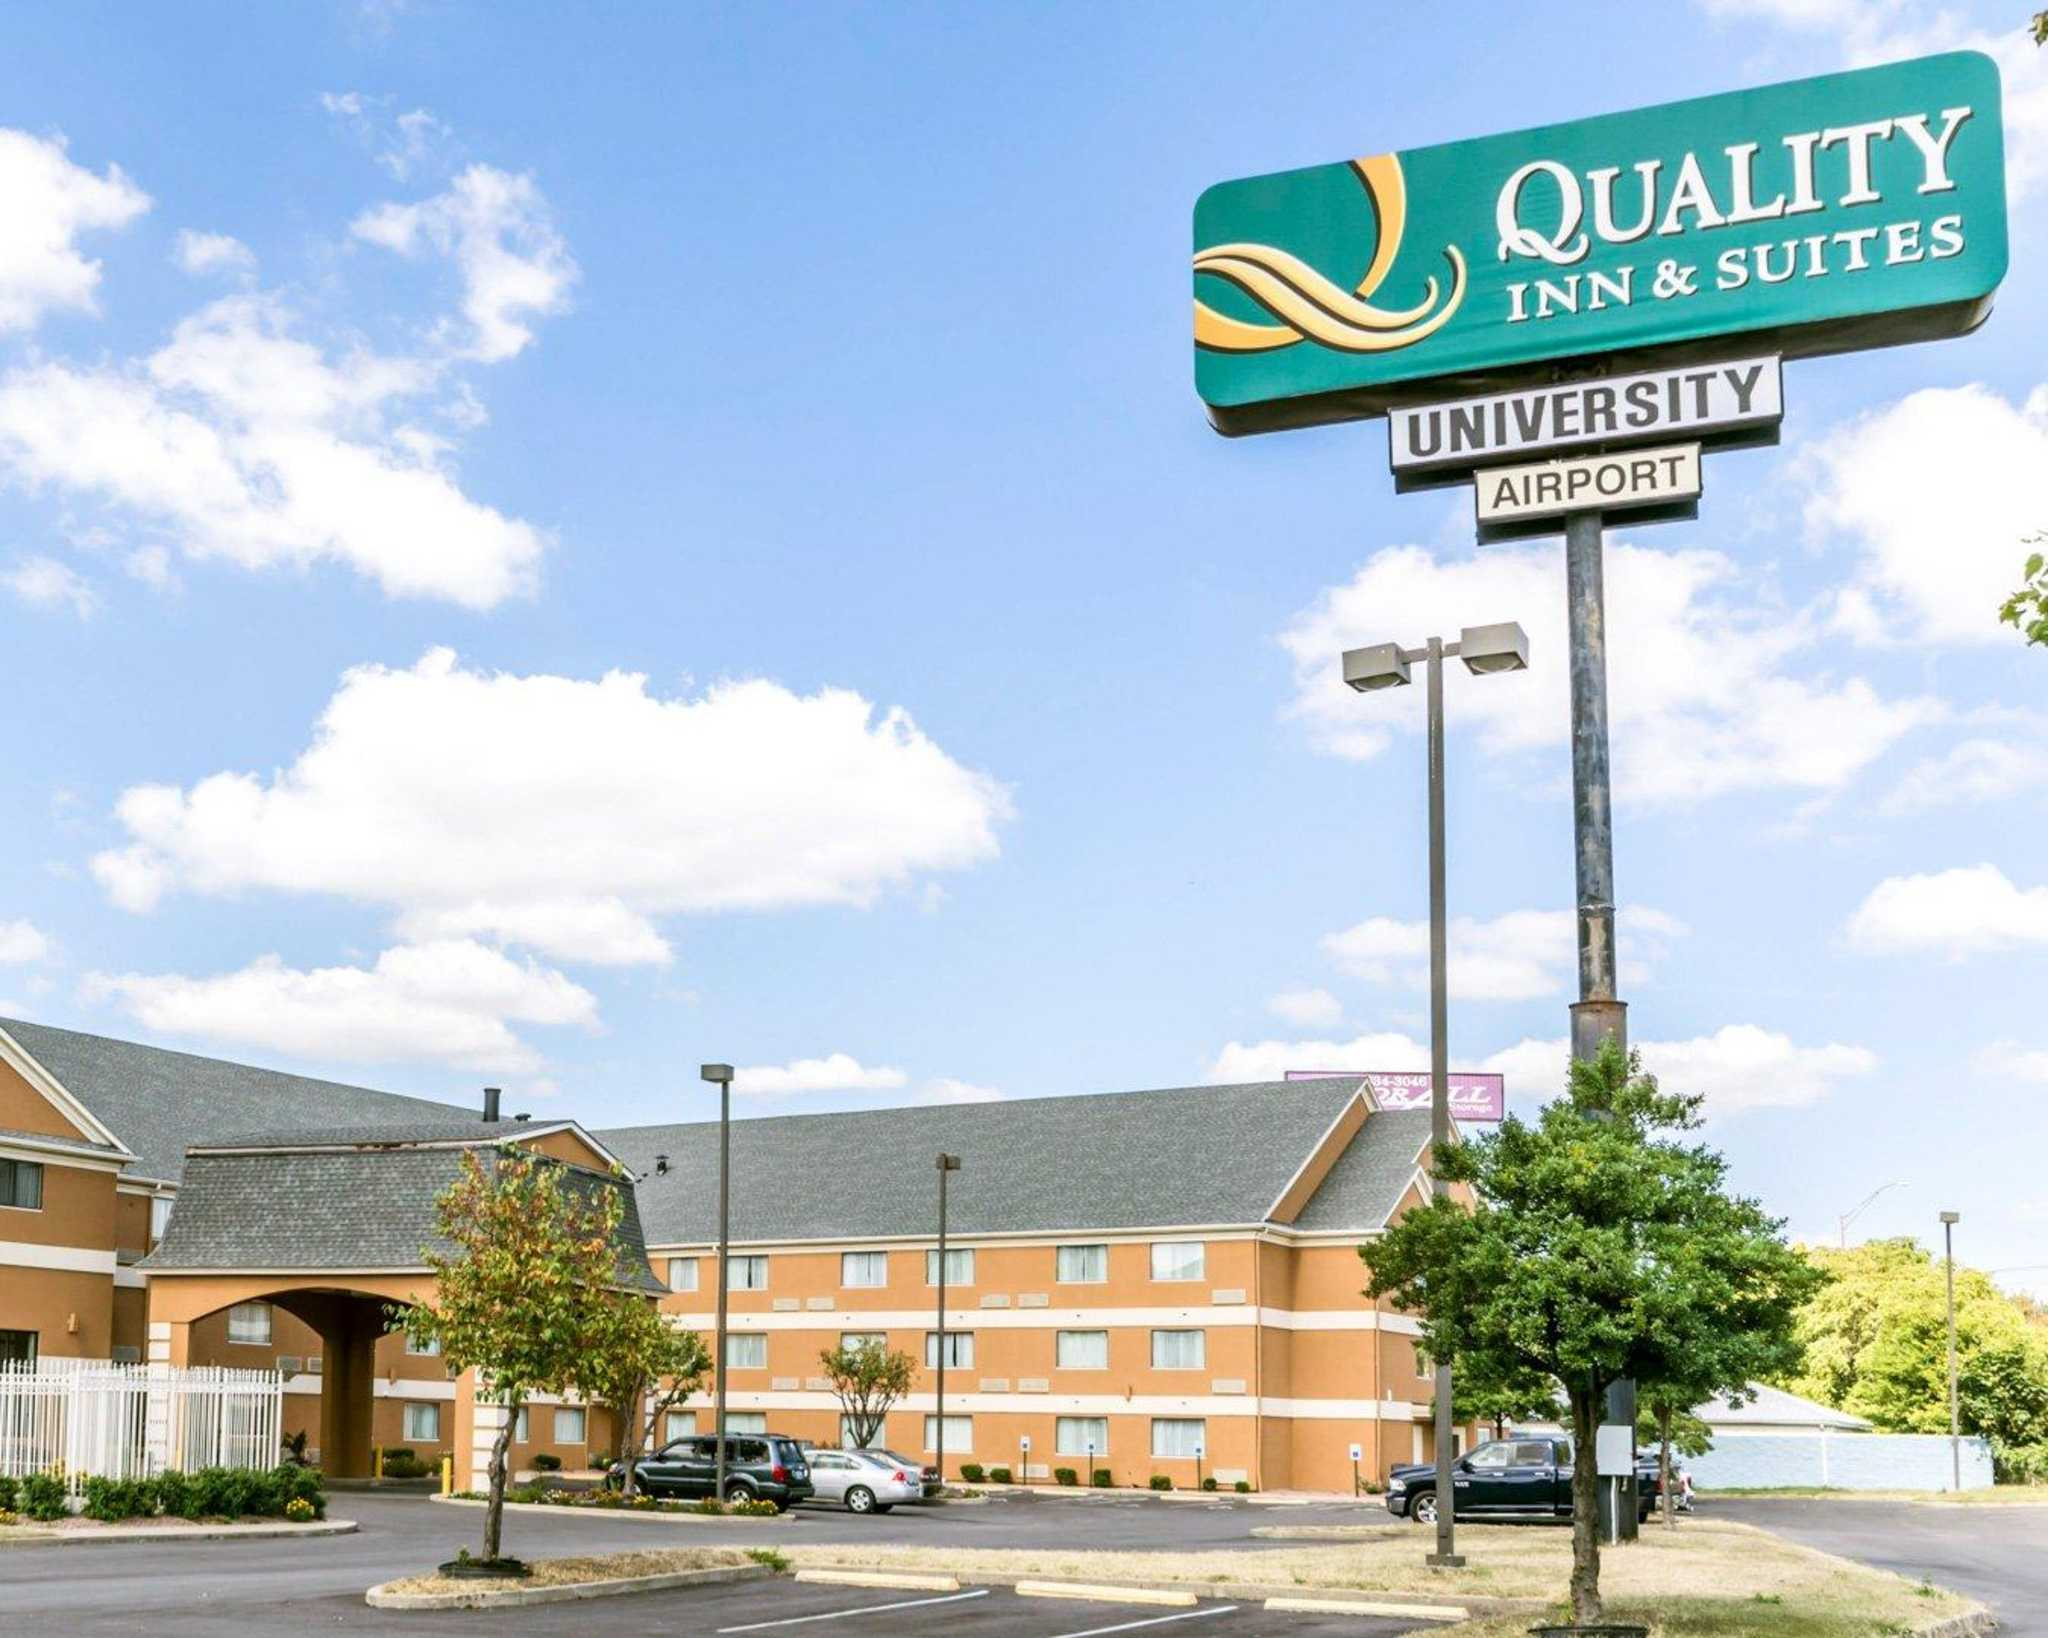 Quality Inn & Suites University/Airport image 2